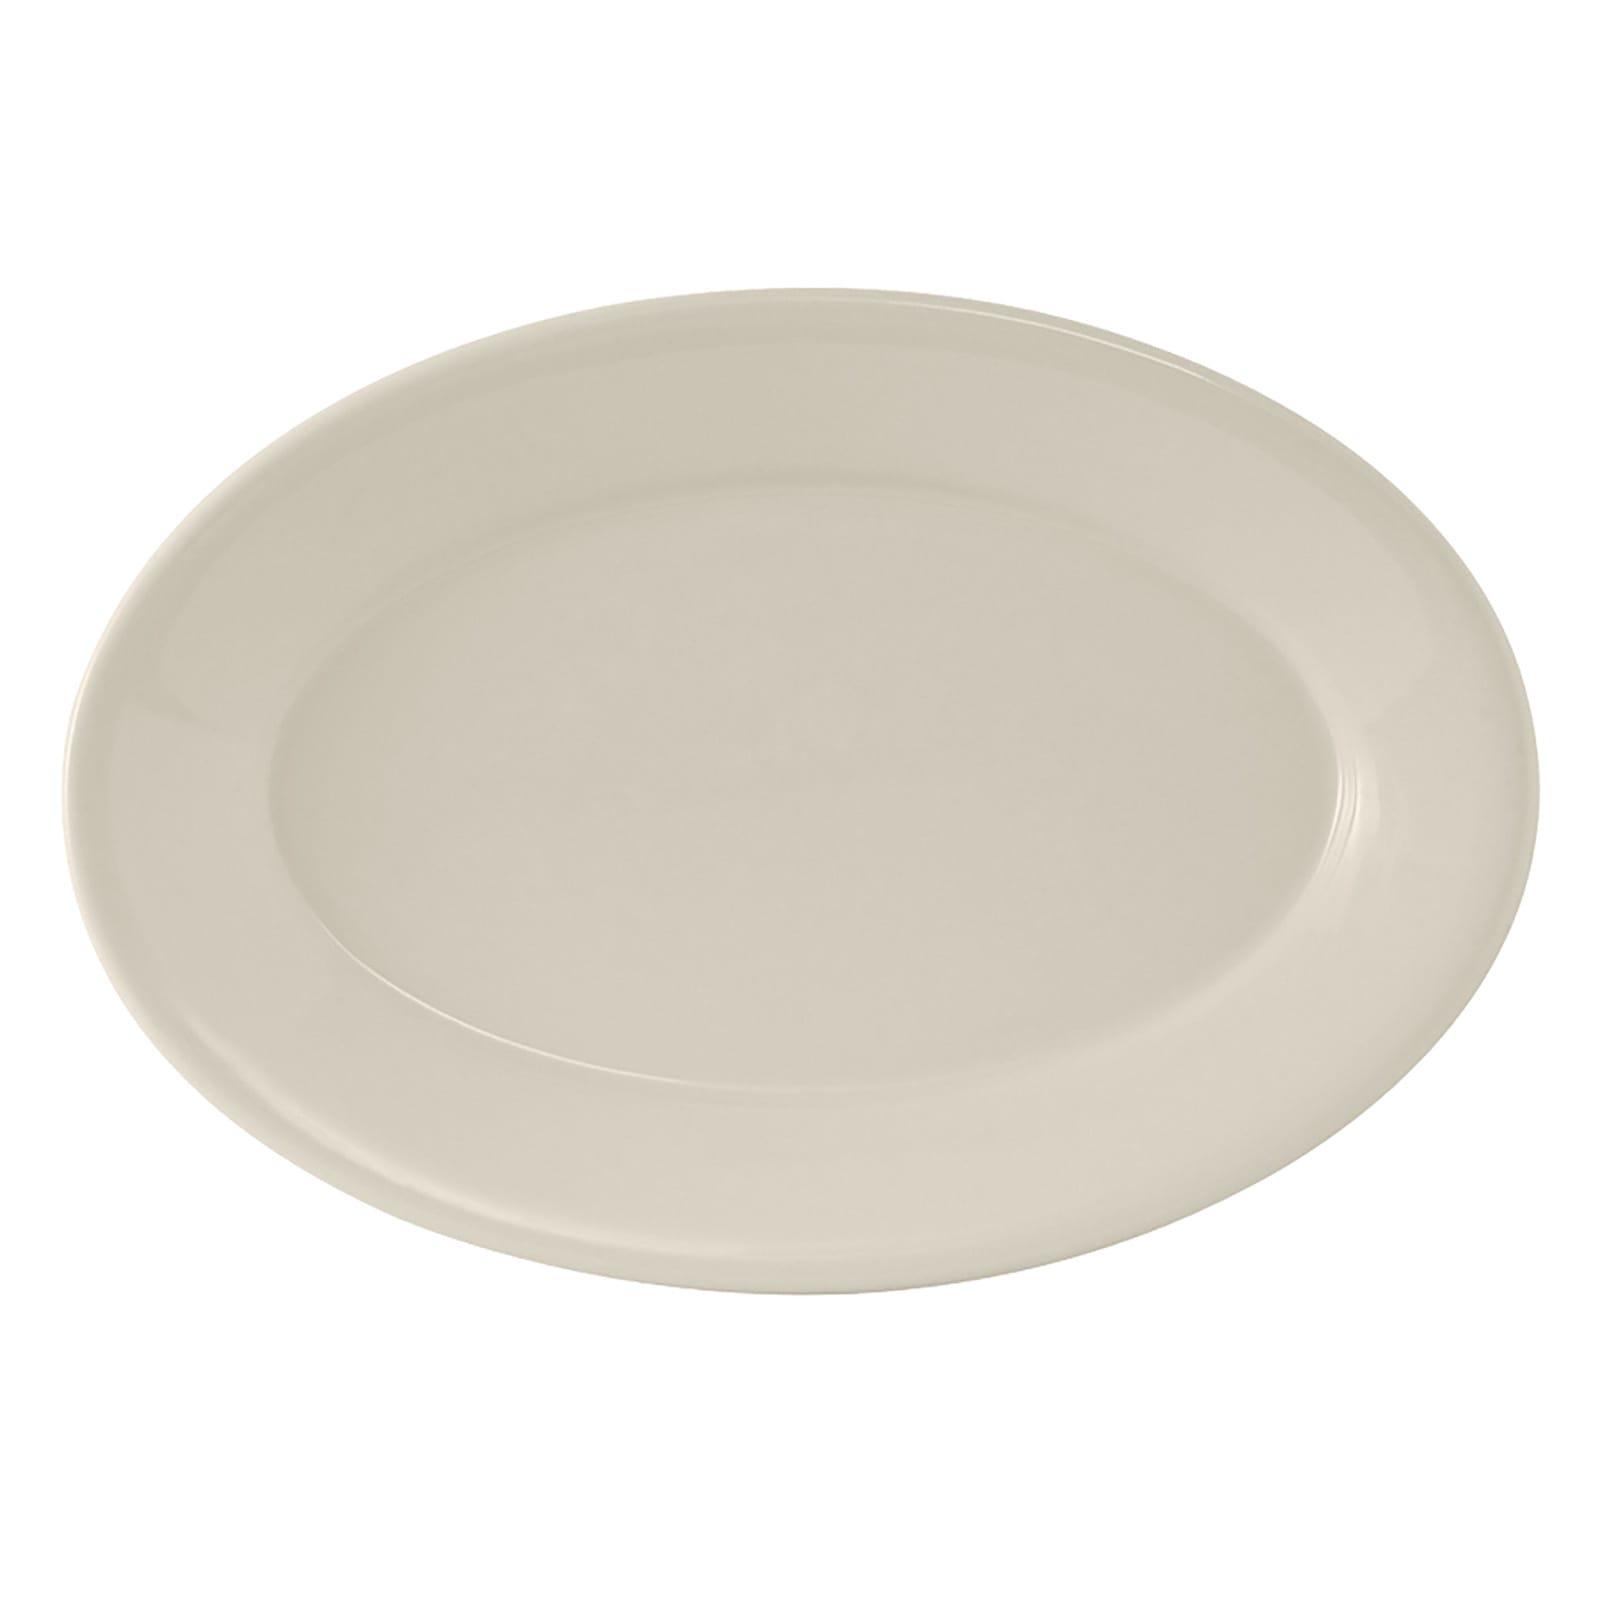 "Tuxton TRE-012 Oval Reno Platter - 10.5"" x 7.38"", Ceramic, American White"